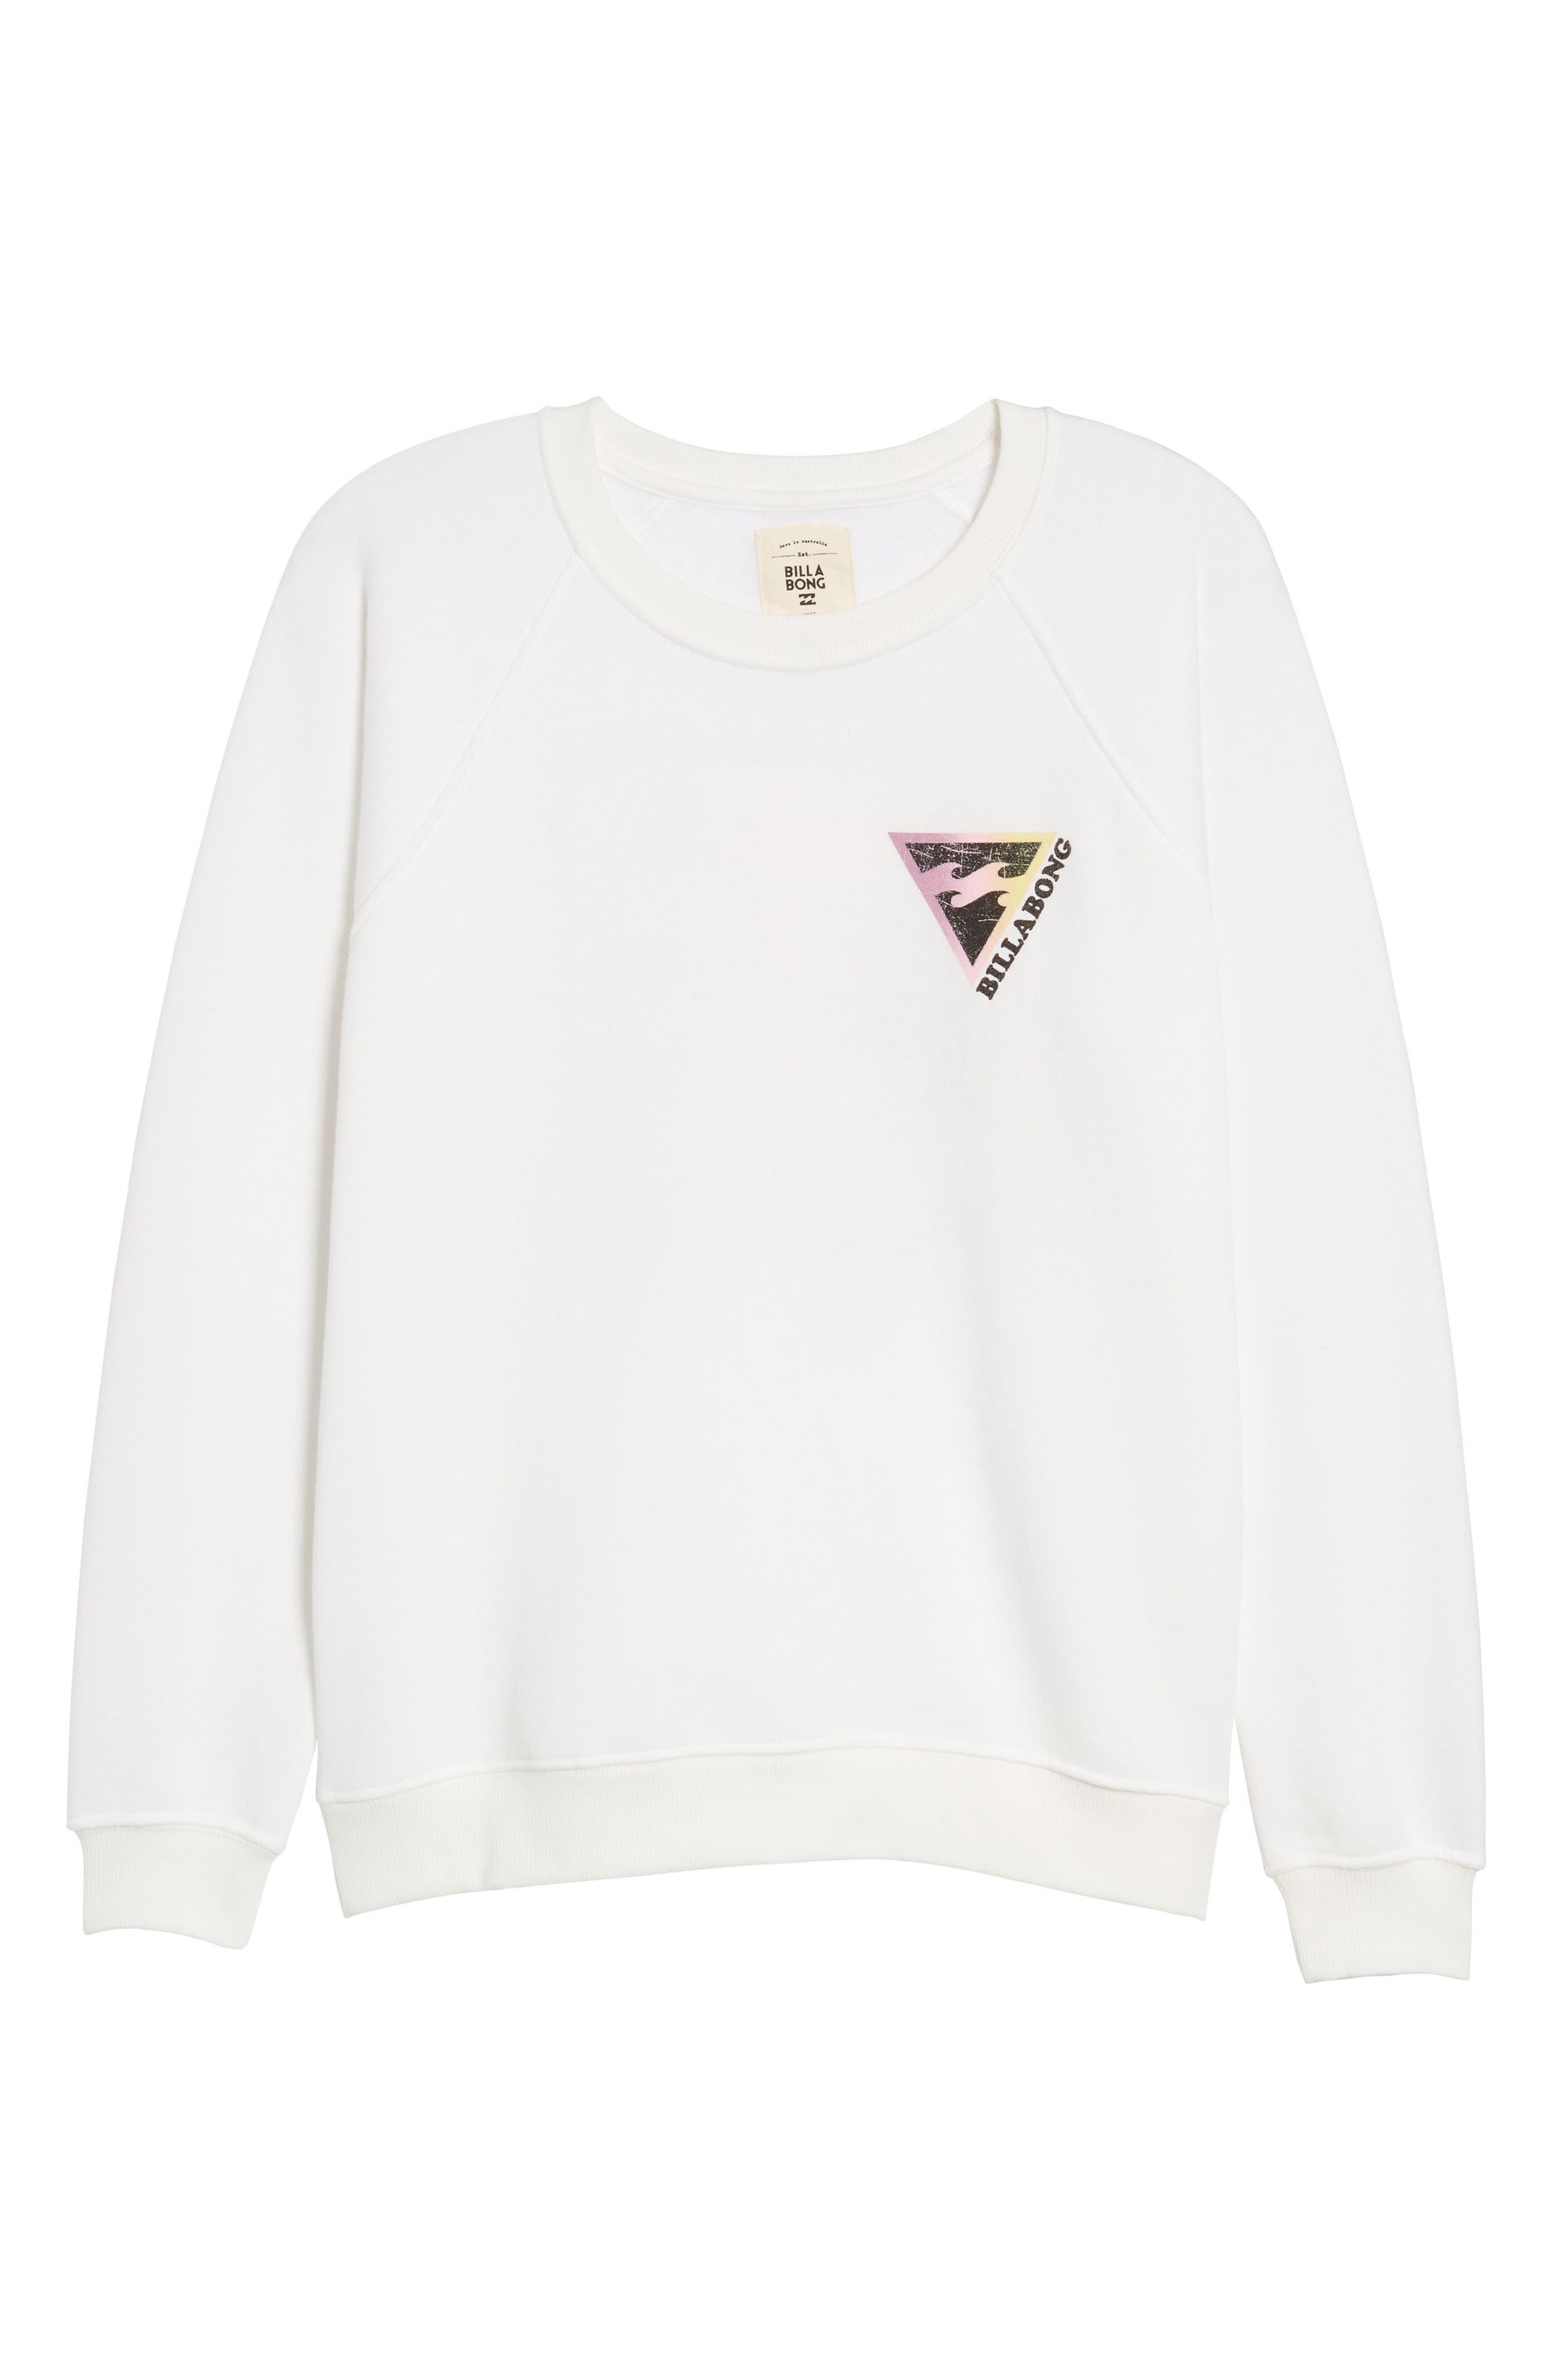 Since '73 Sweatshirt,                             Alternate thumbnail 6, color,                             190